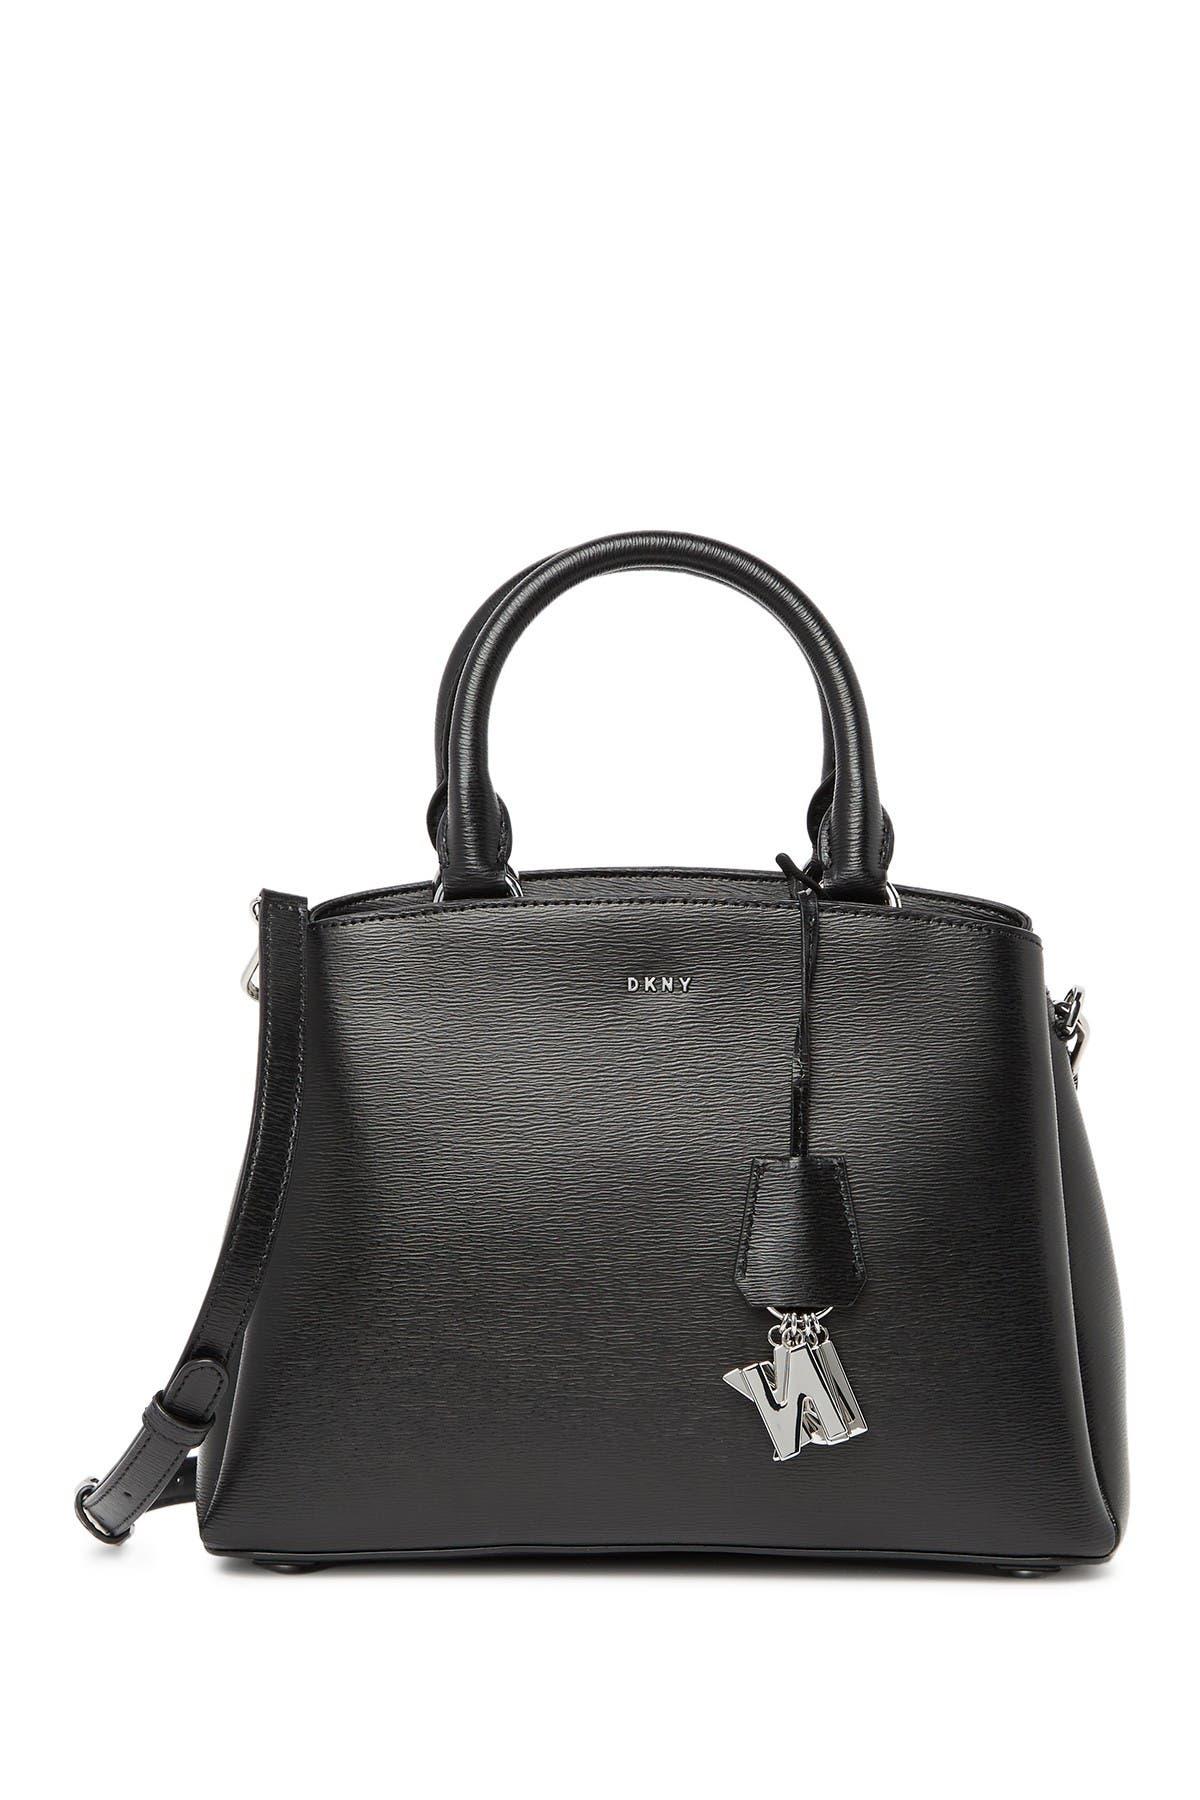 Image of DKNY Paige Medium Leather Satchel